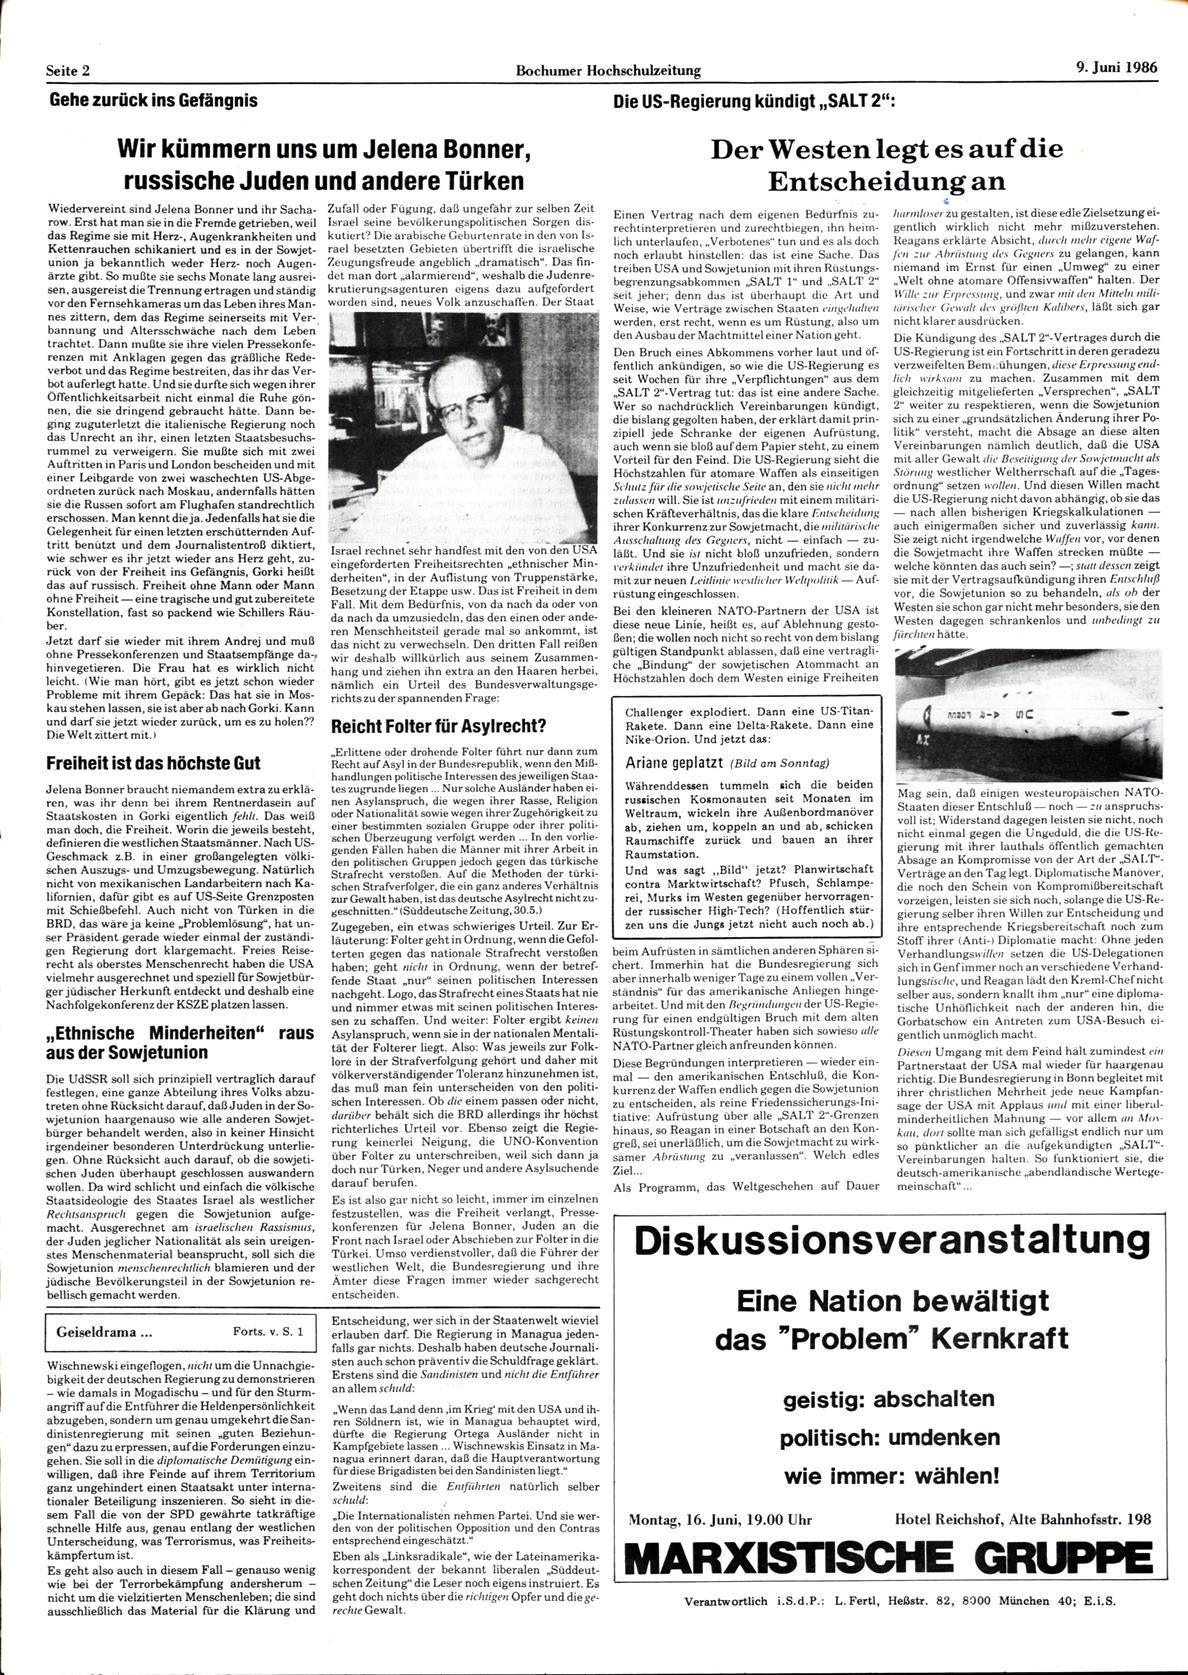 Bochum_BHZ_19860609_131_002